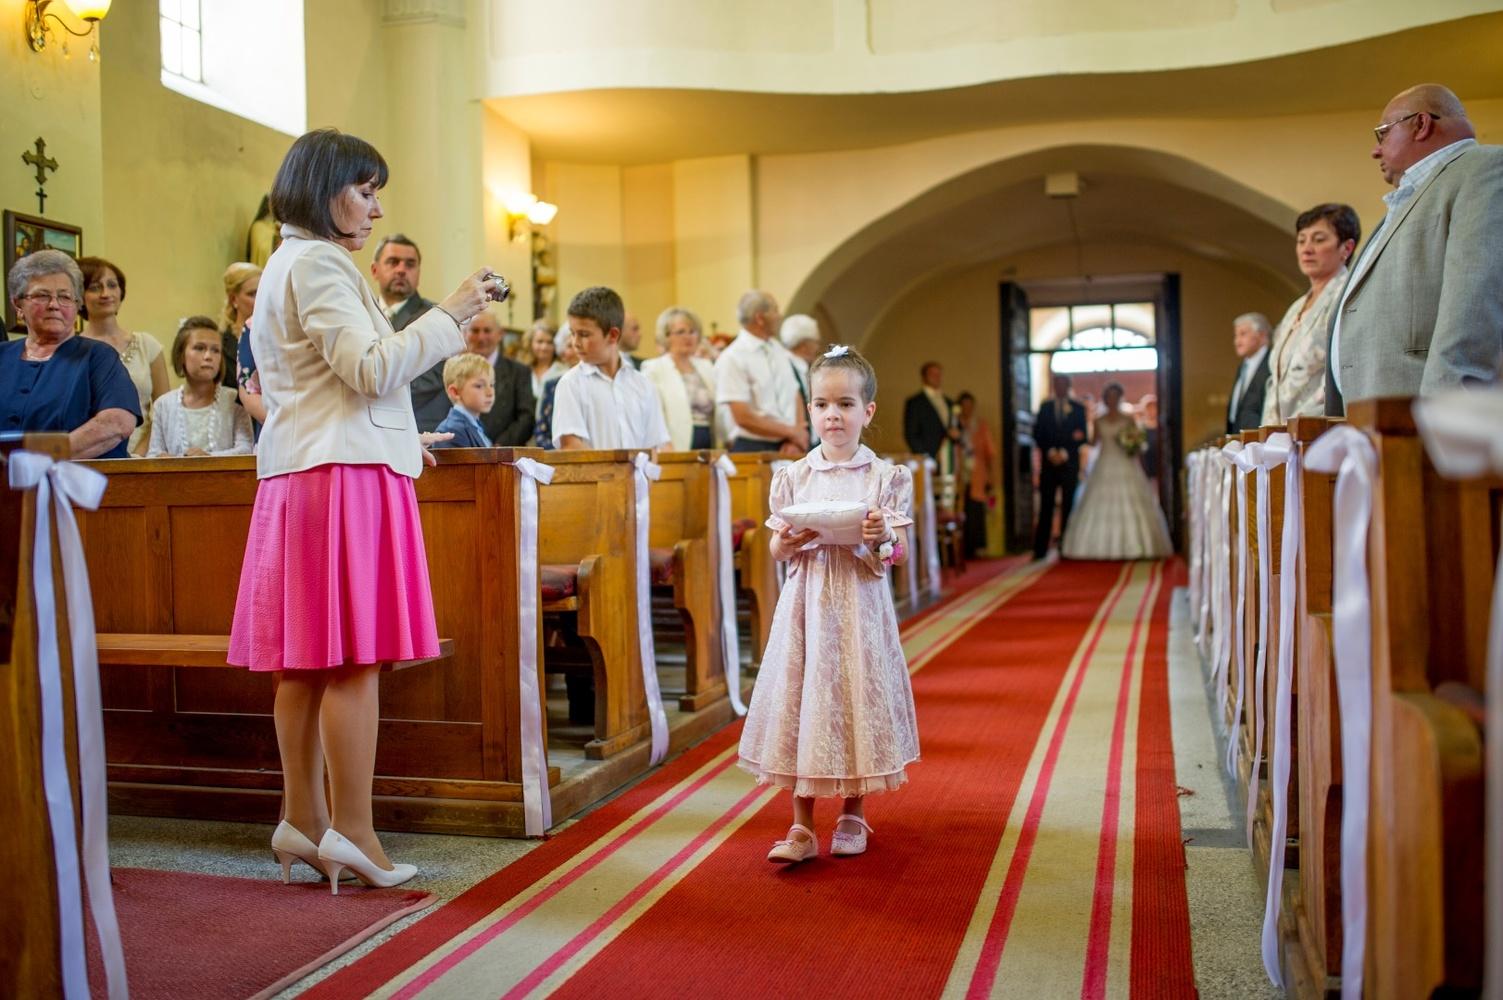 http://www.fotoz.sk/images/gallery-18/normal/eskuvo-fotozas_svadobne-fotenie_425.jpg